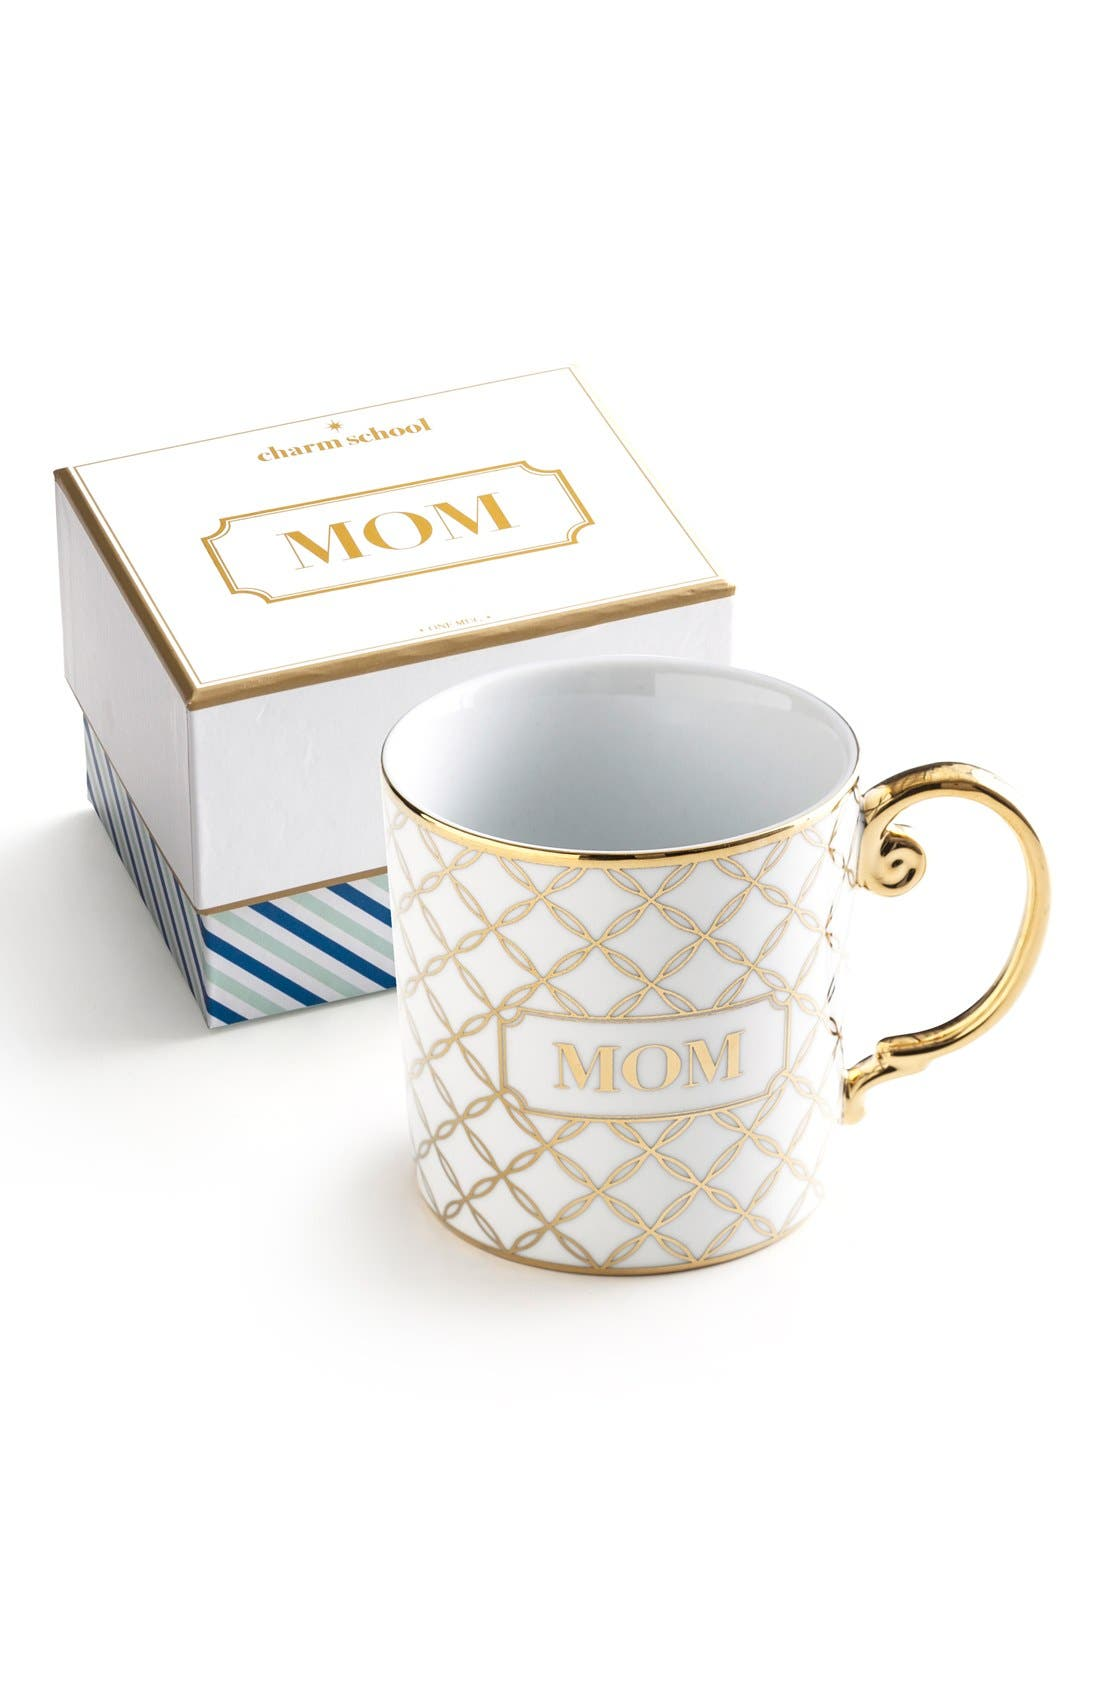 Alternate Image 1 Selected - Rosanna 'Mom' Porcelain Coffee Mug